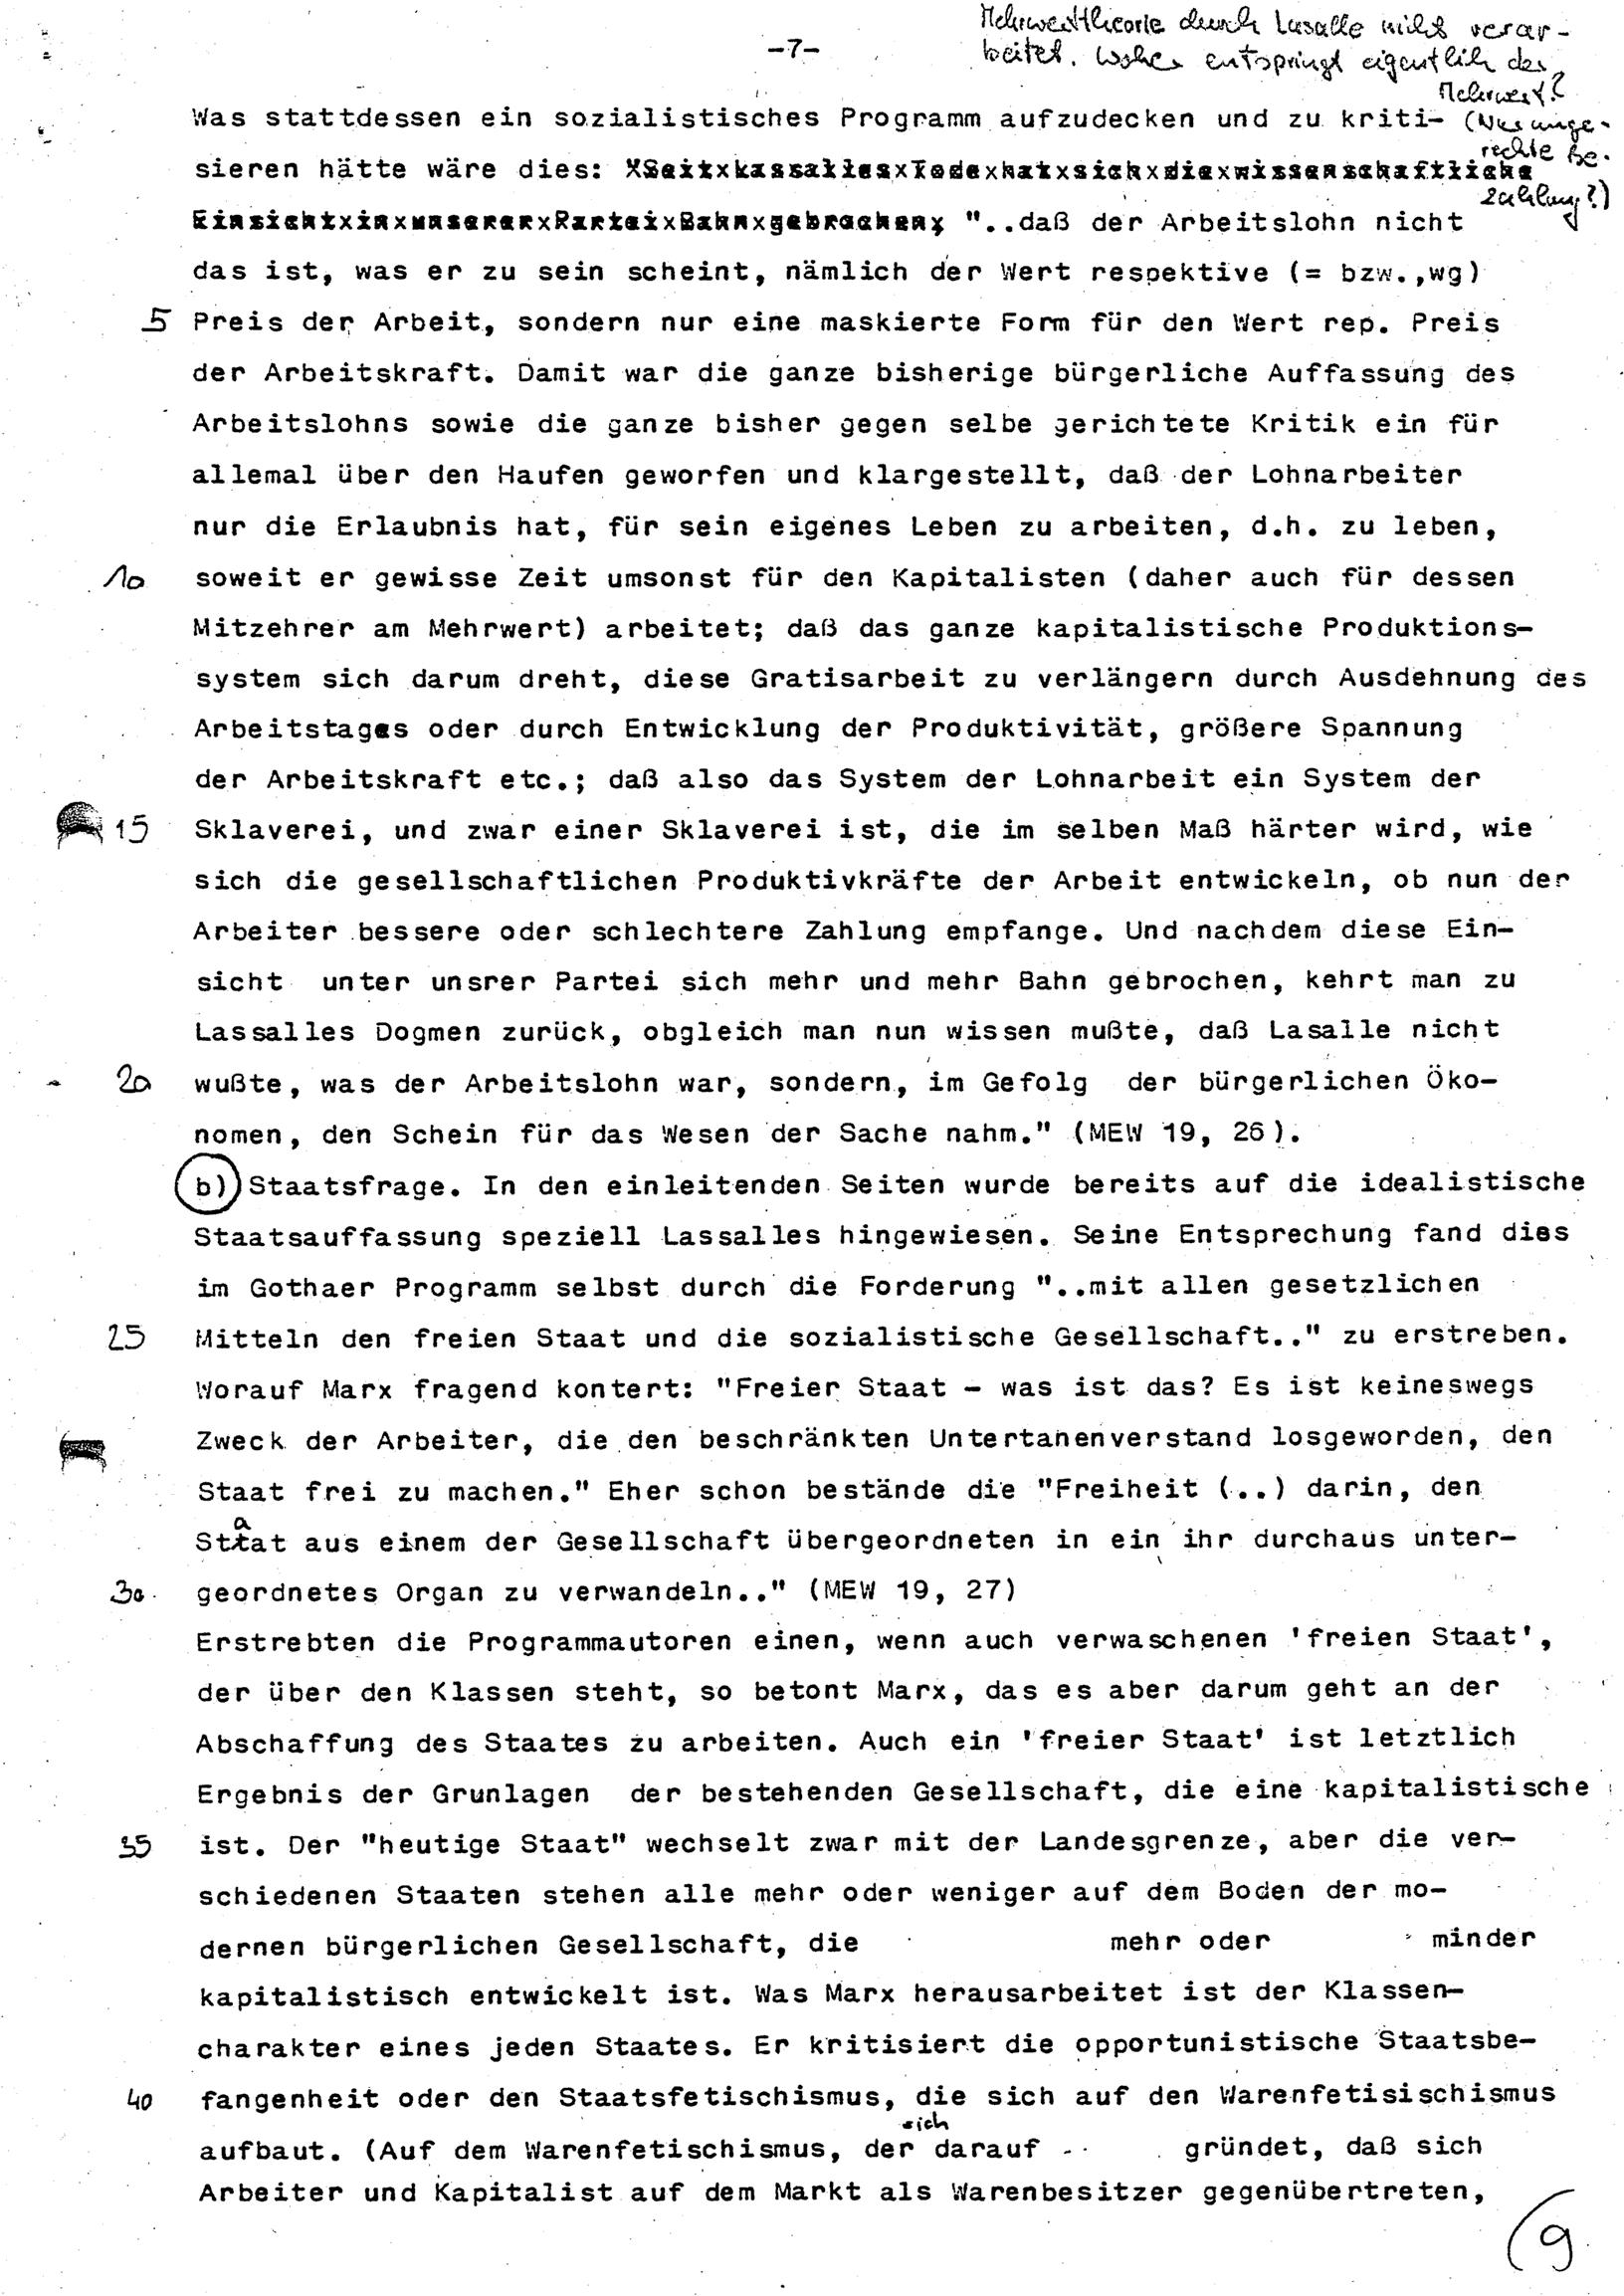 Ulm_KGU_Arbeitsheft_19830425_015_012